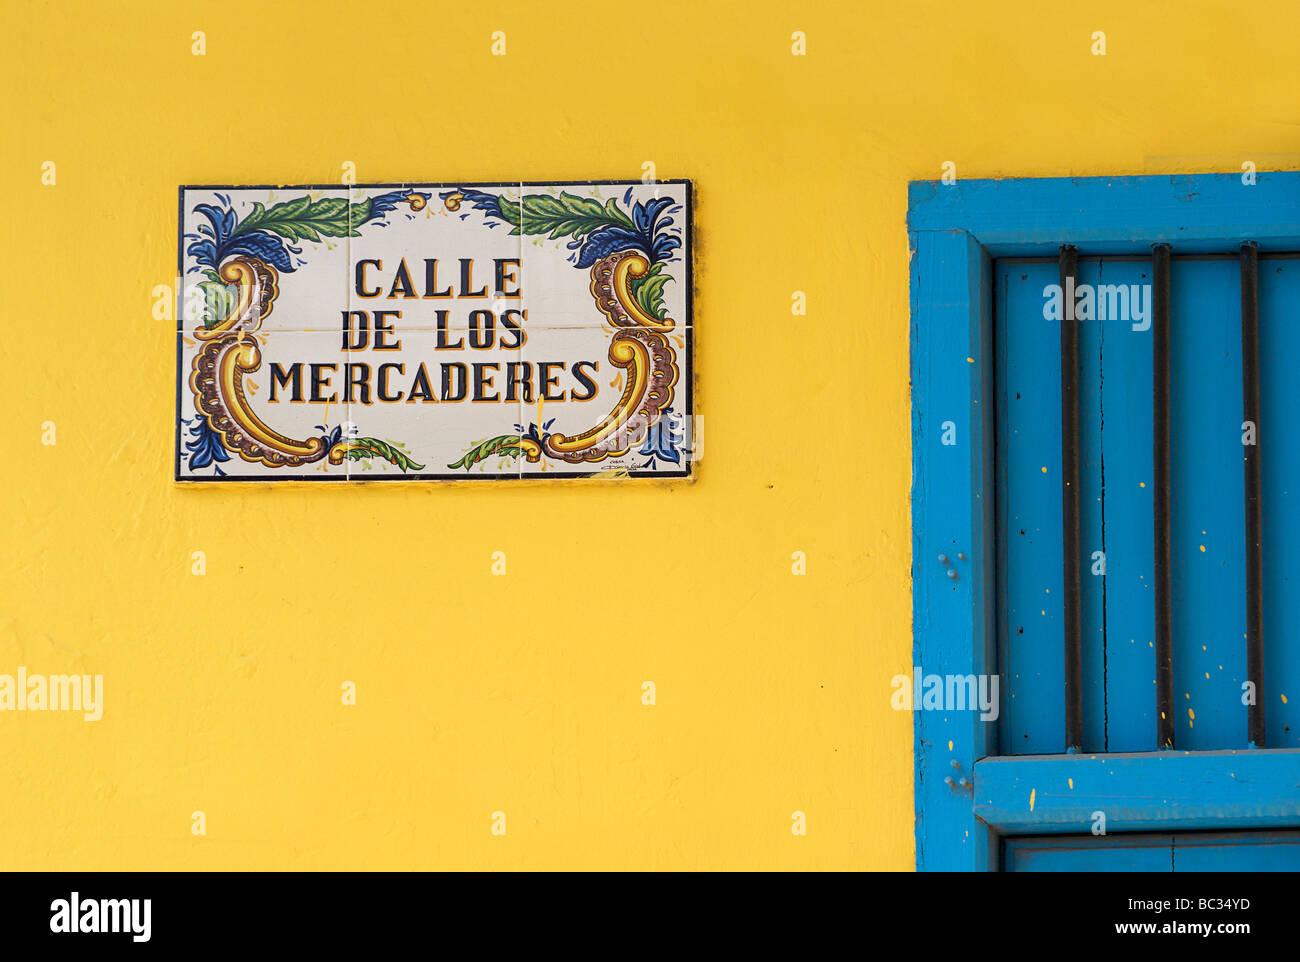 CALLE DE LOS MERCADERES, Straßenschild, Alt-Havanna, Kuba Stockbild